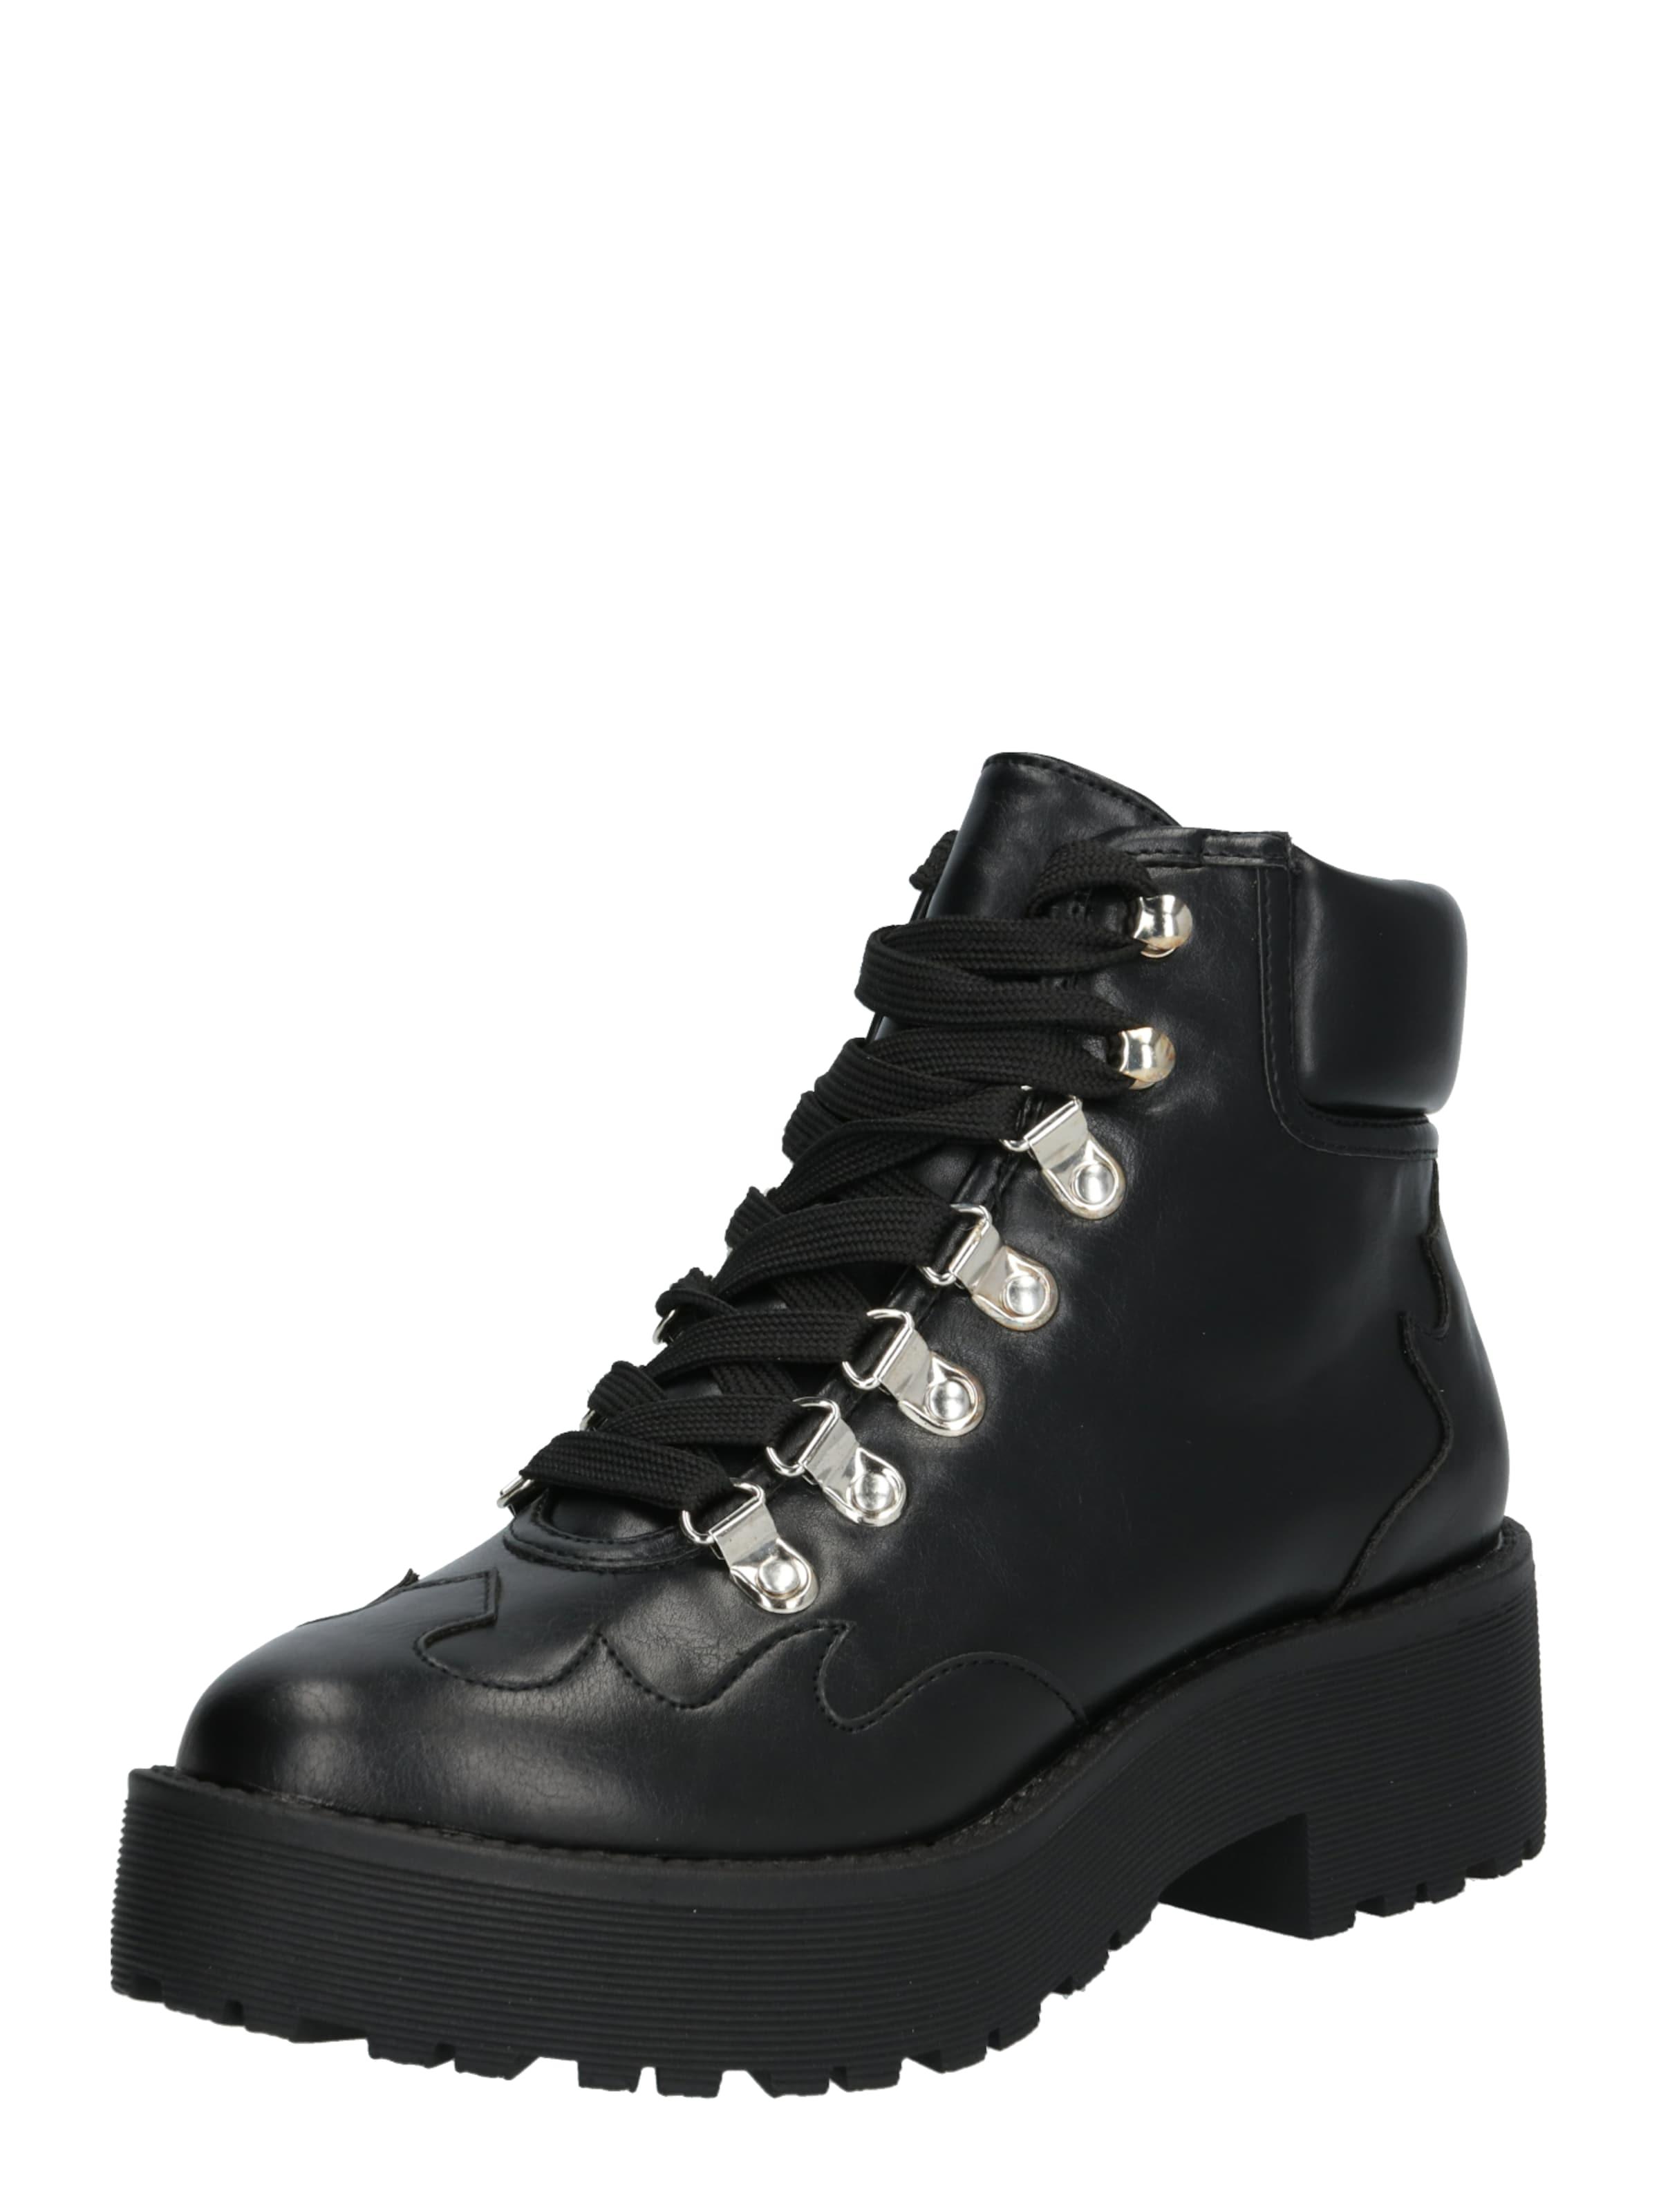 Na Stiefeletten Laceup kd Detail Ankle Western Schwarz Boot' In hxrtQsdC